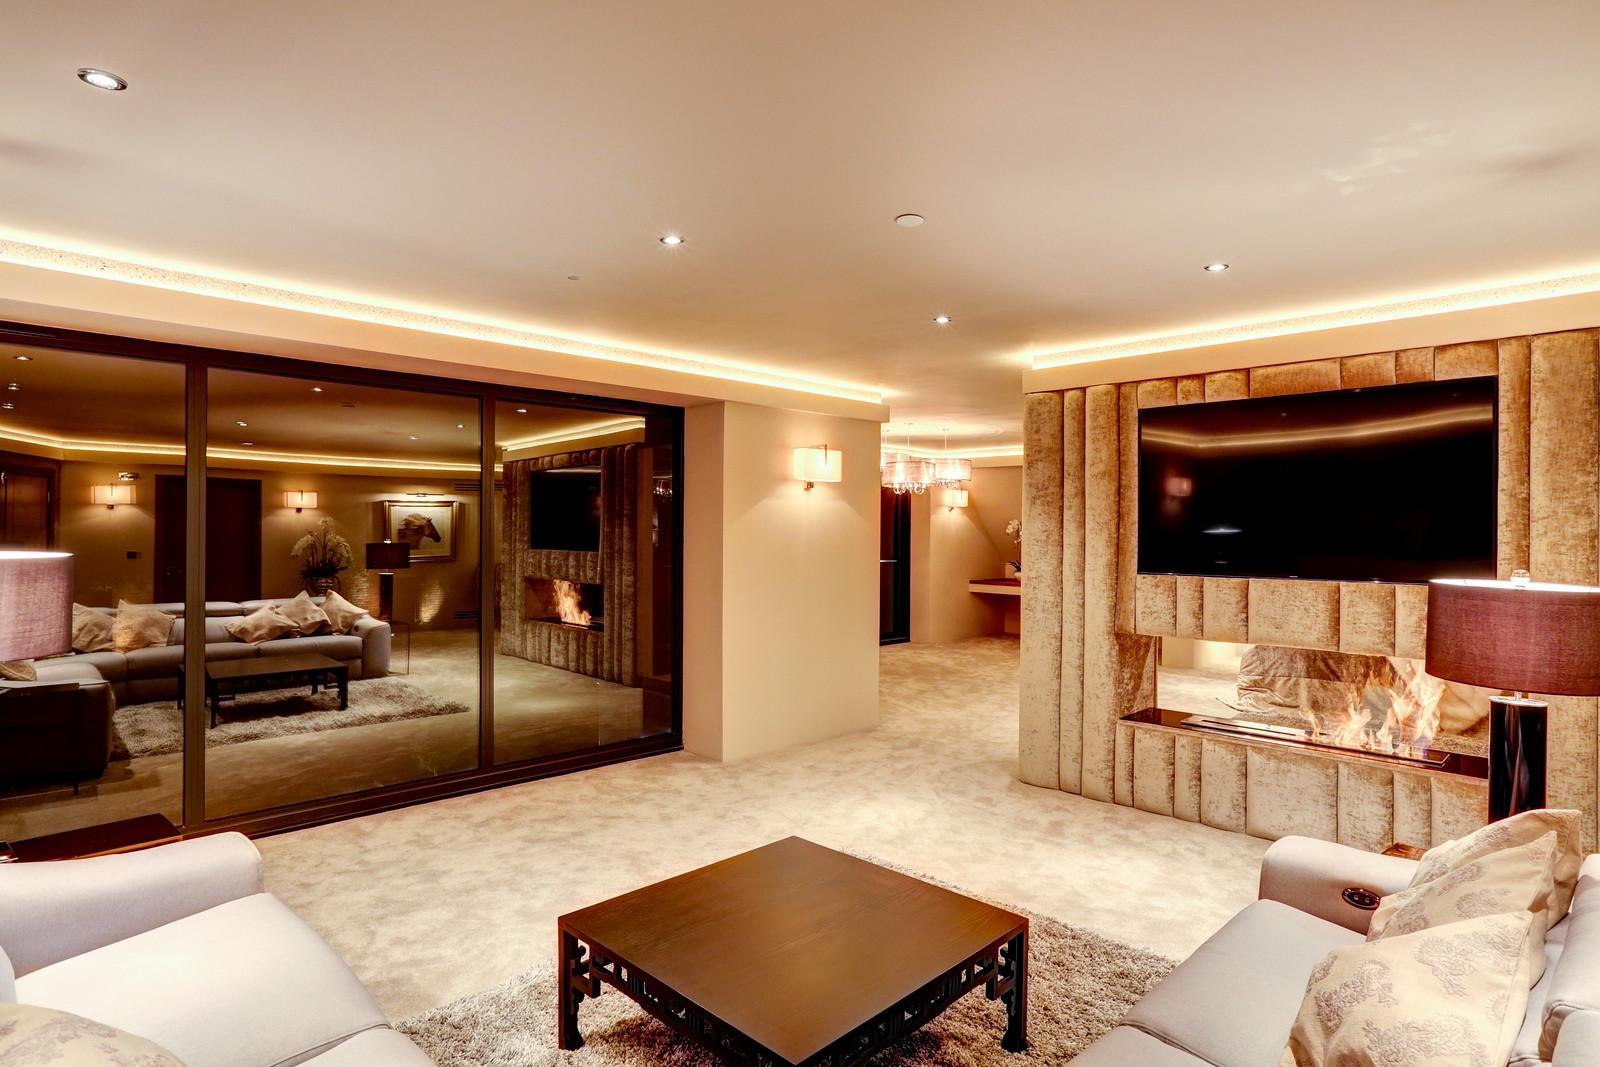 Master suite, Tanglewood, Colston Bassett Luxury home by Guy Phoenix